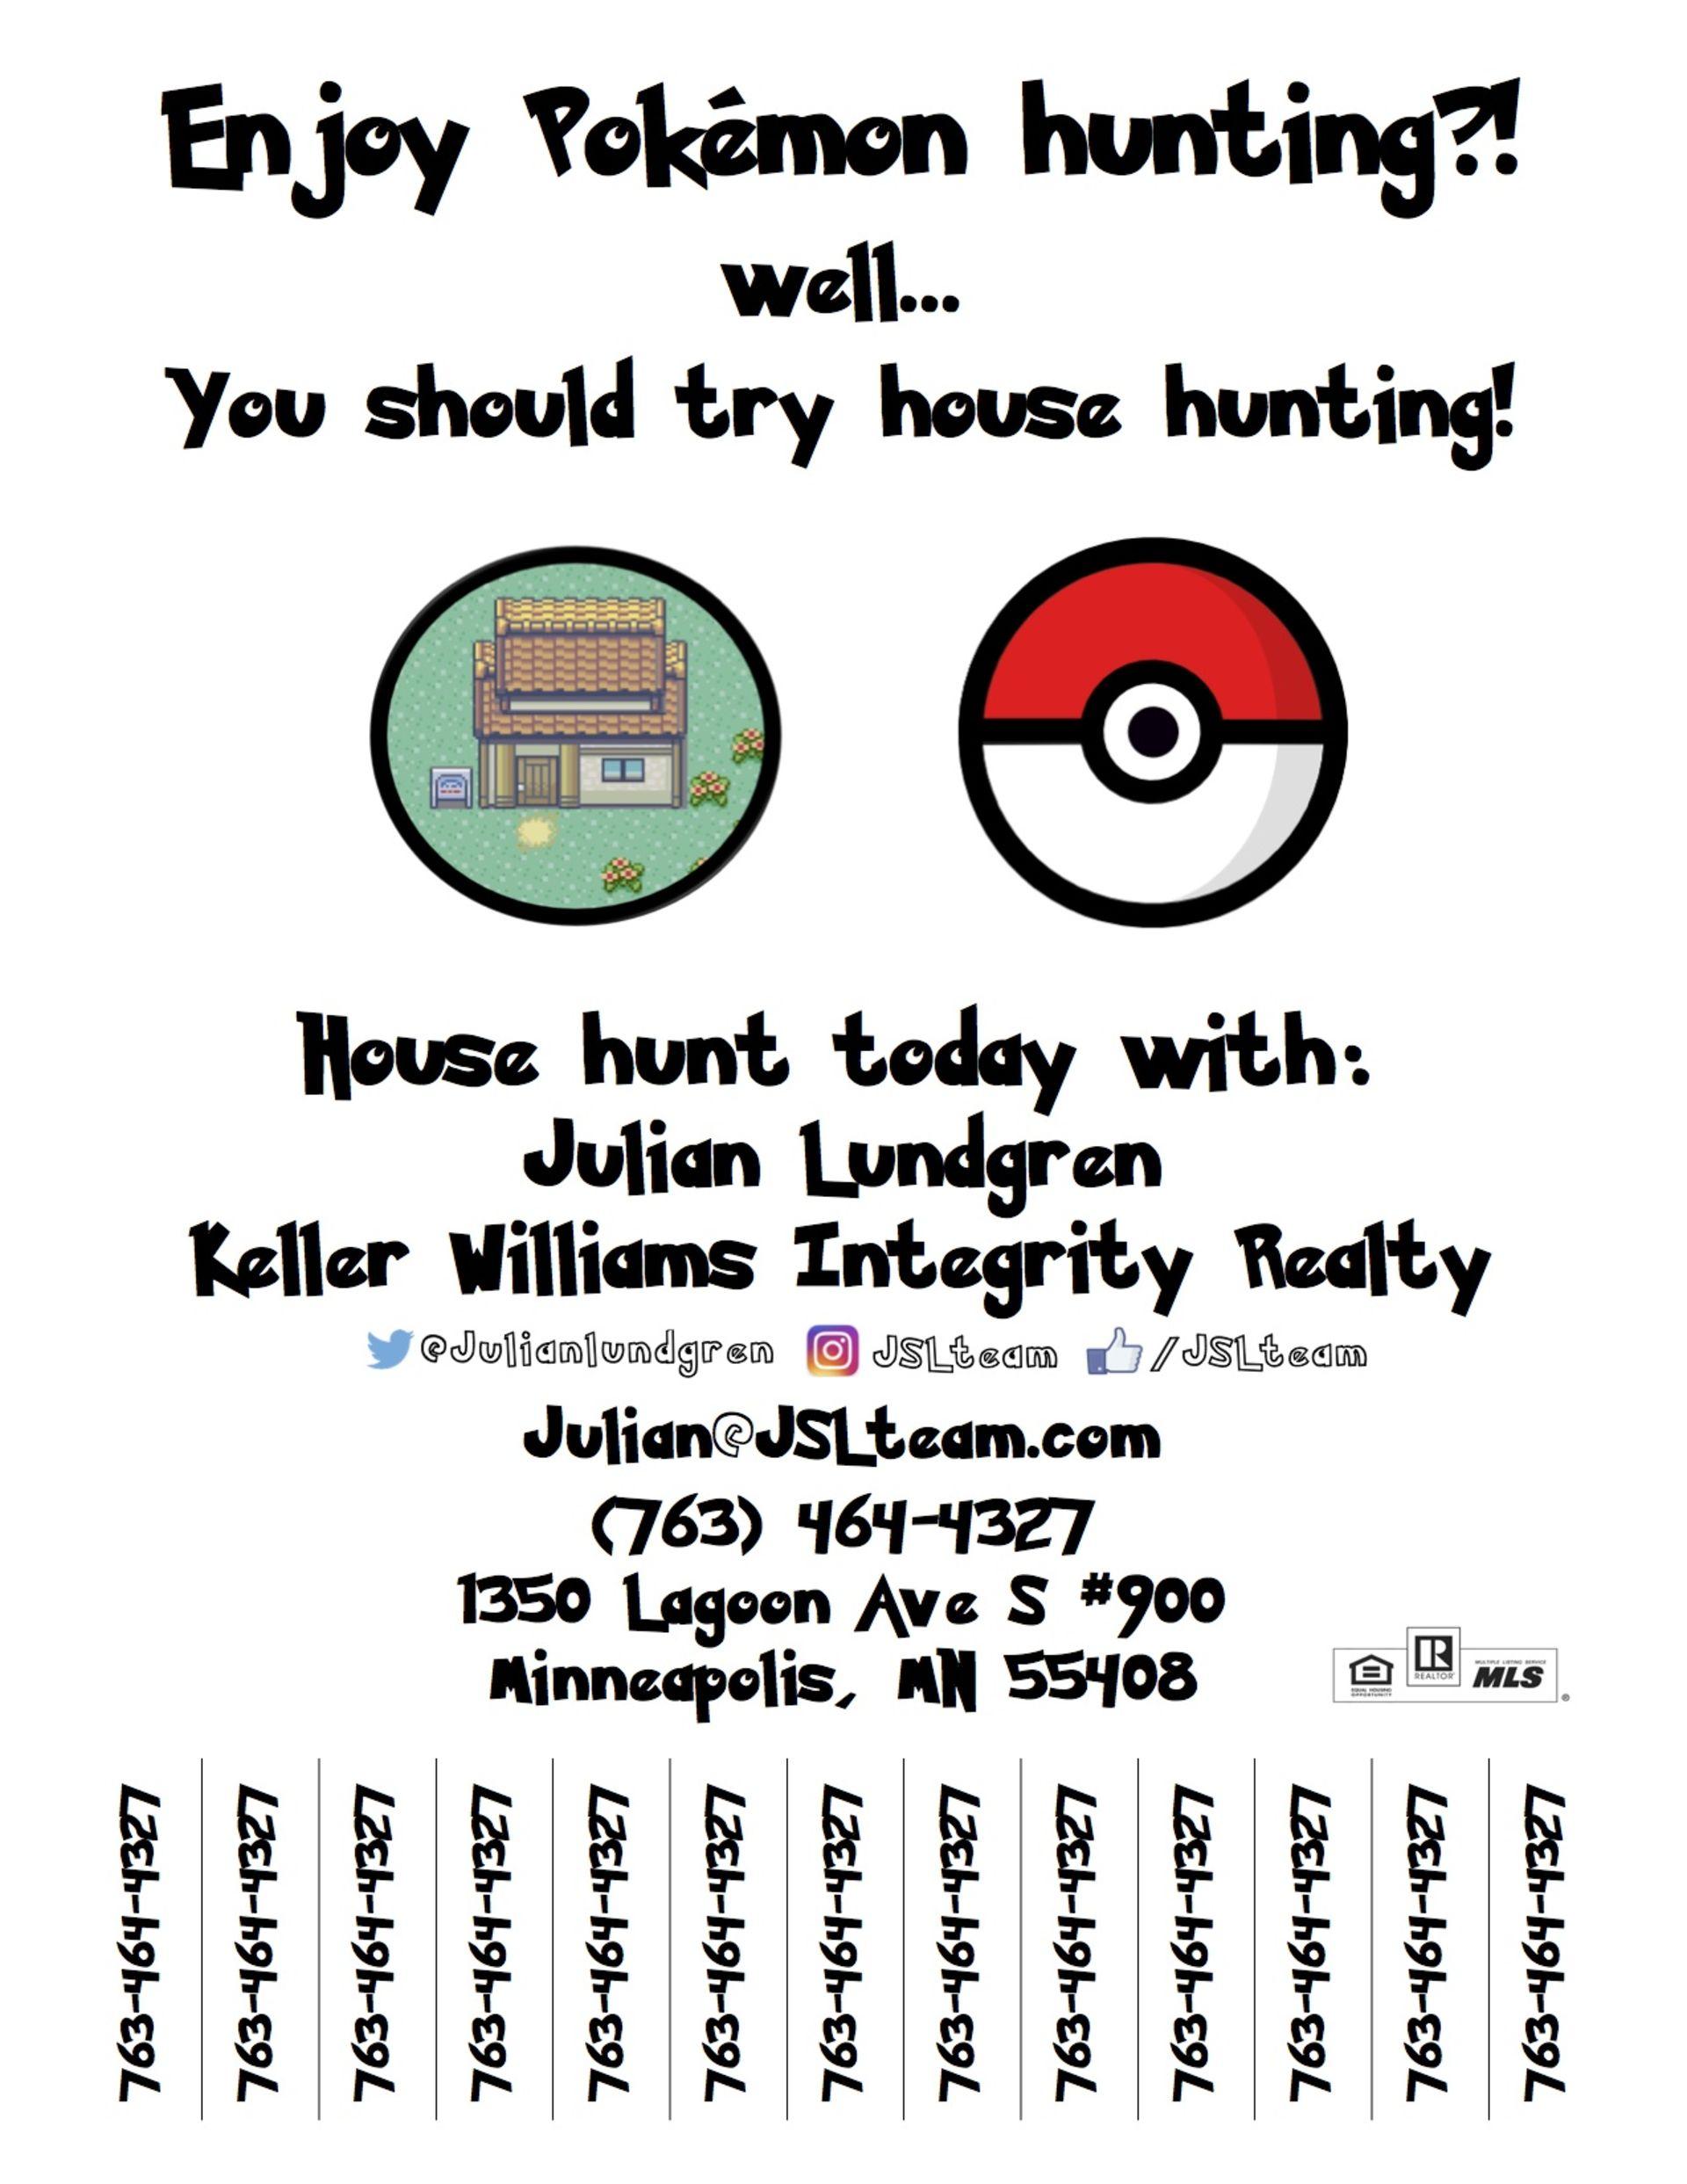 PokemonGo and Real Estate Meet